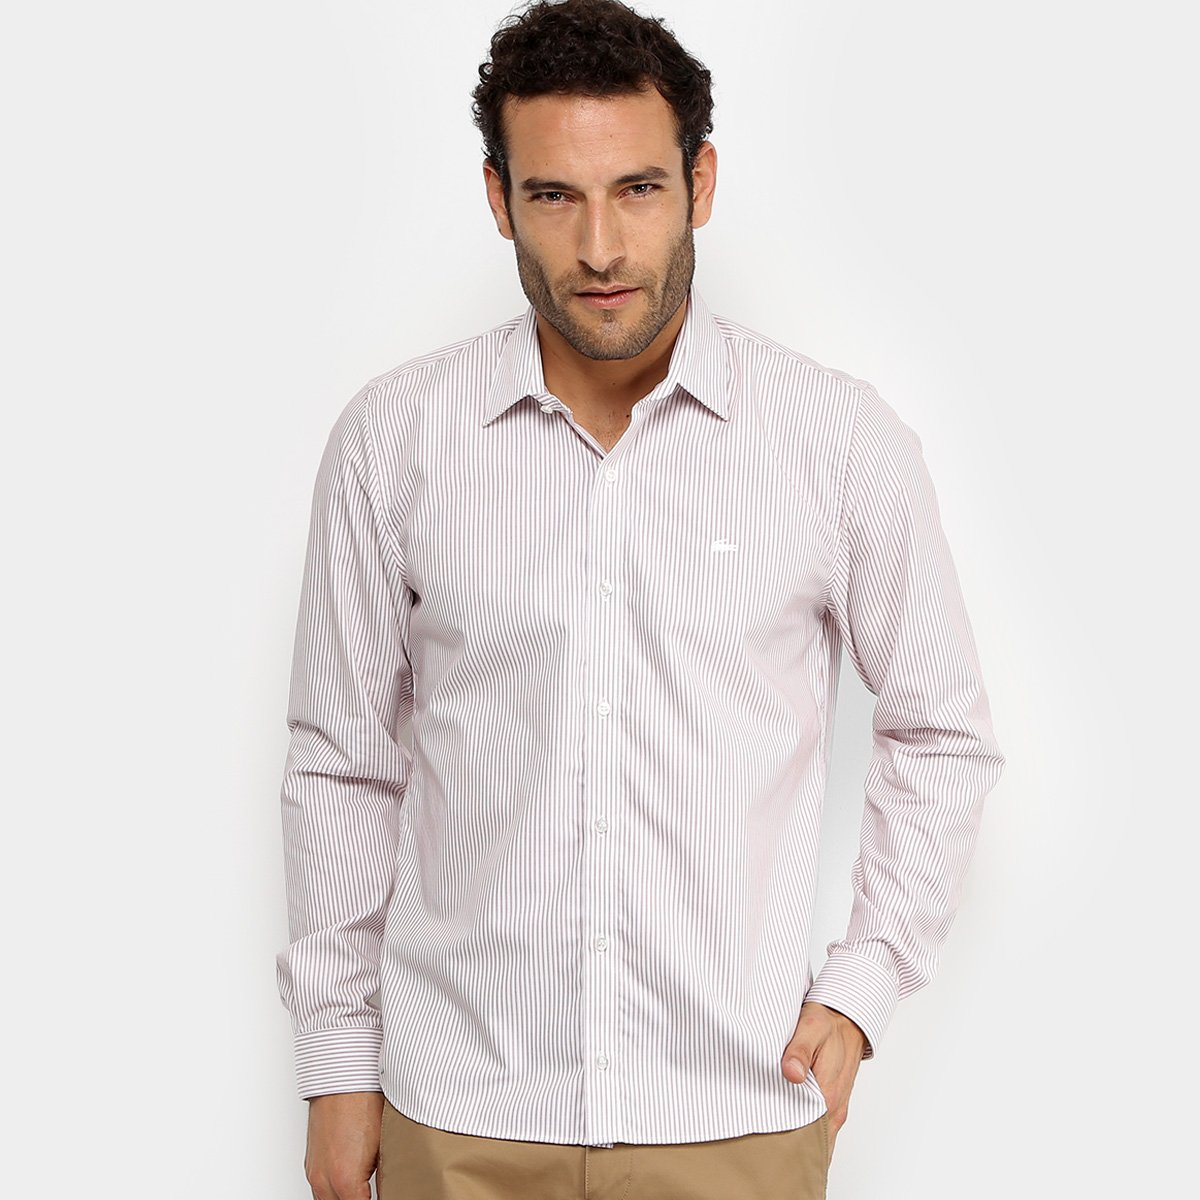 db4ff8a113237 Camisa Listrada Lacoste ML Regular Fit Masculina - Rosa Claro - Compre Agora